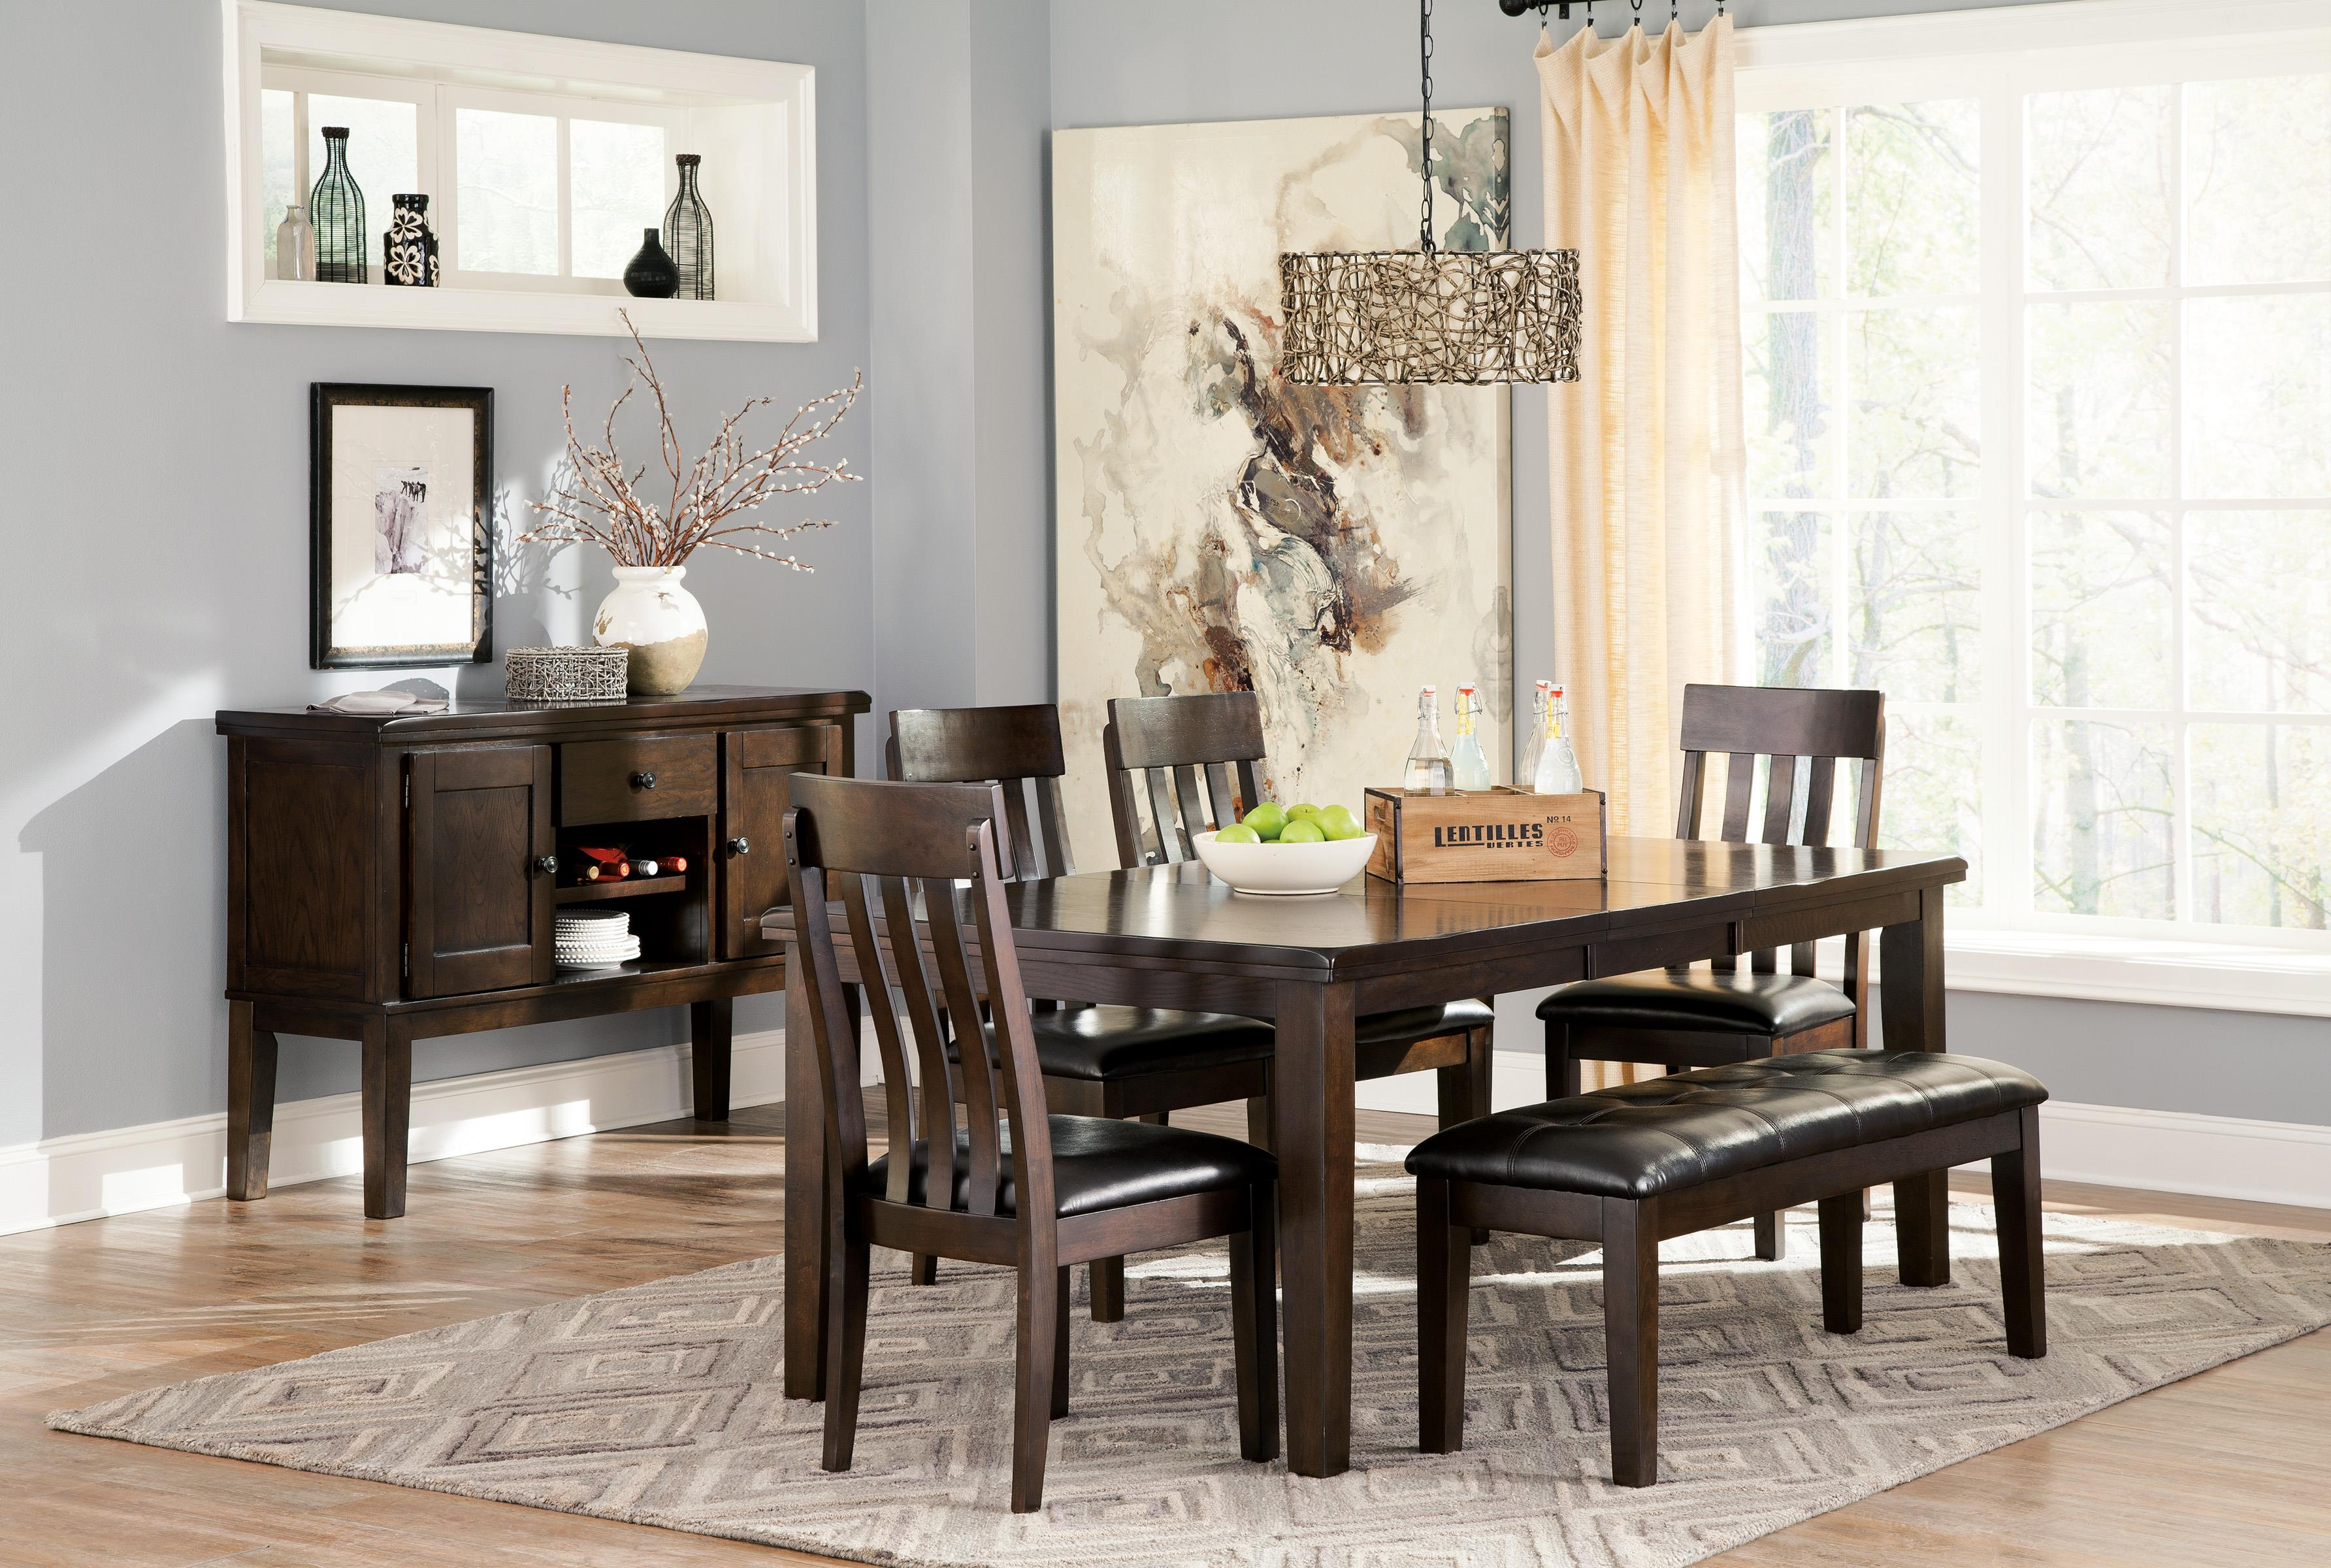 Haddigan 6-Piece Rectangular Dining Room Table W/ 4